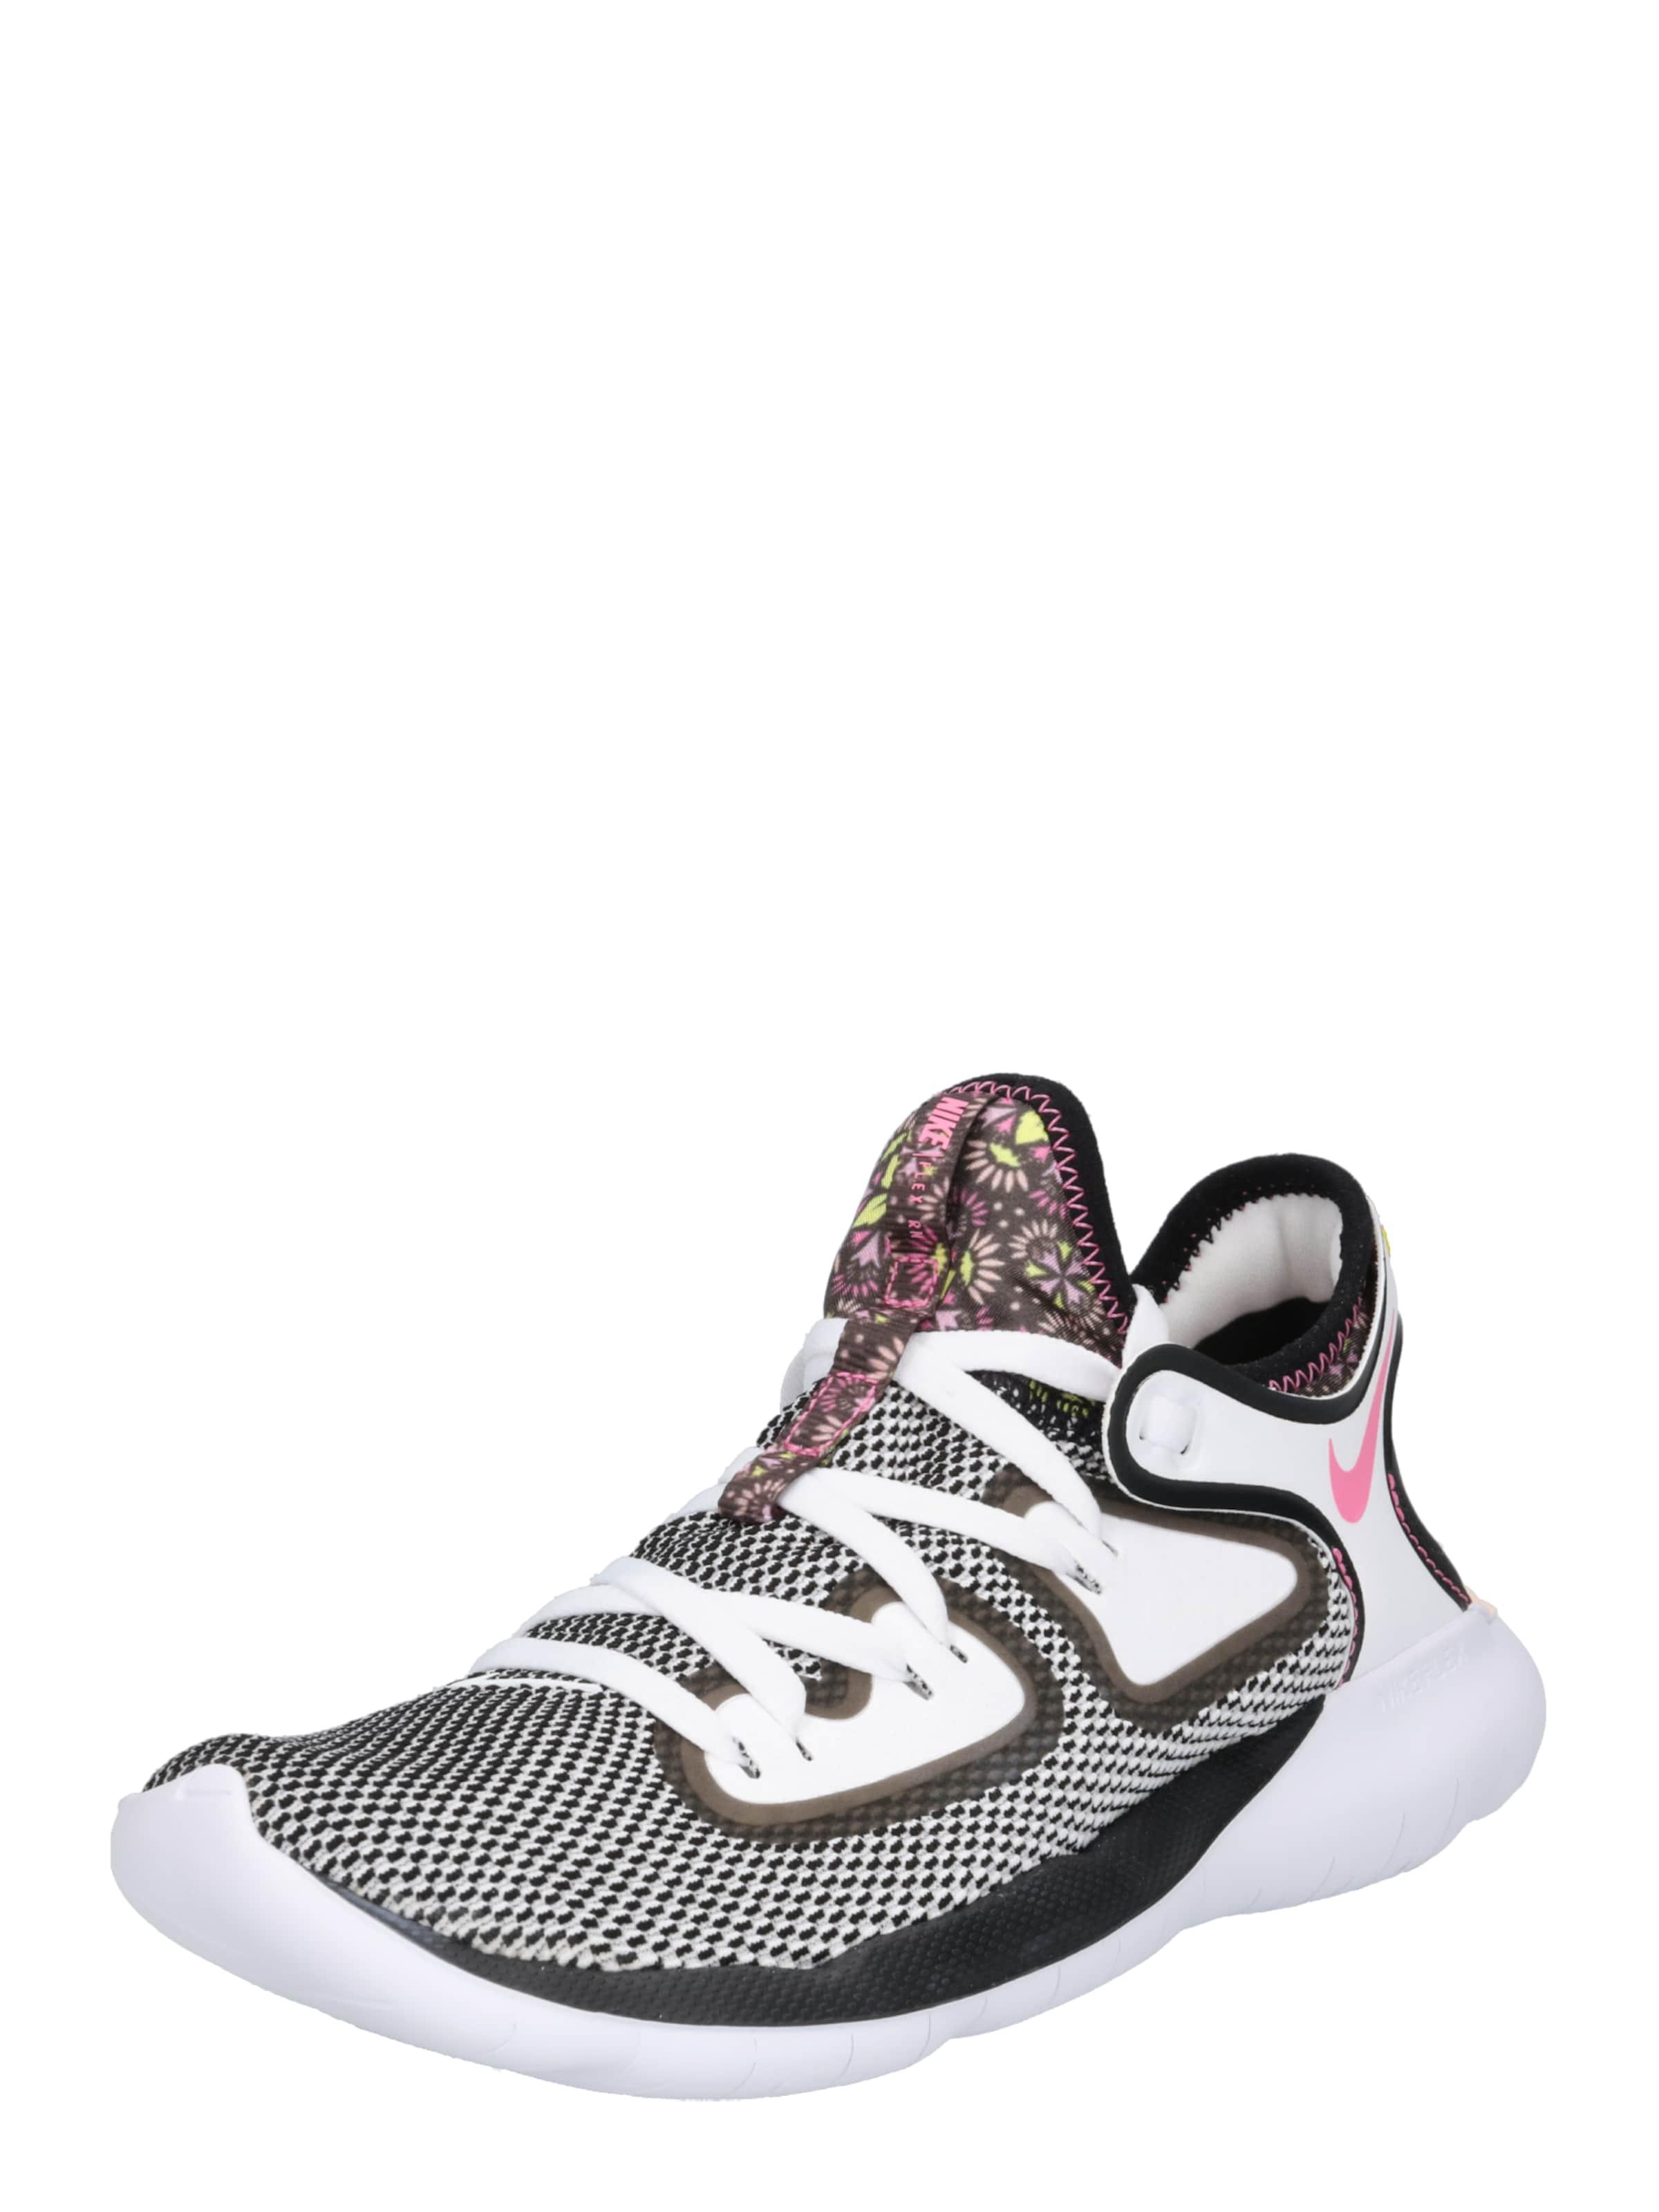 'flex' Basses In RoseBlanc NikeBaskets IW29DHE